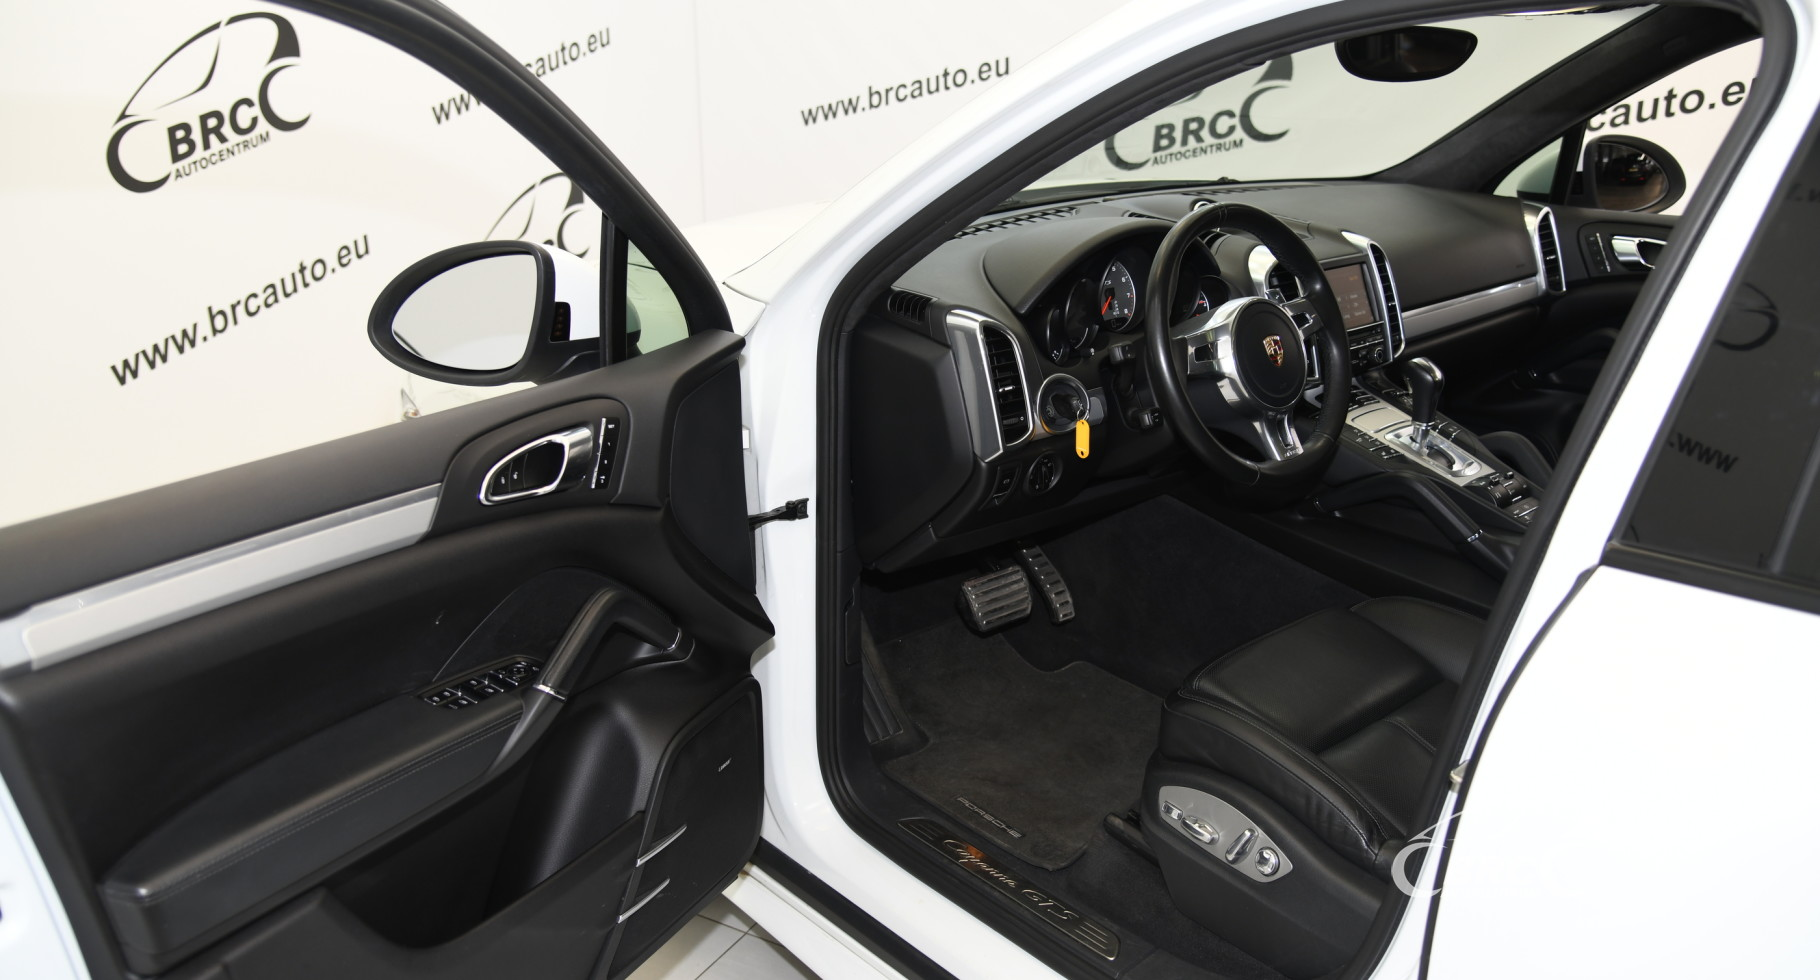 Porsche Cayenne GTS 4.8 Automatas